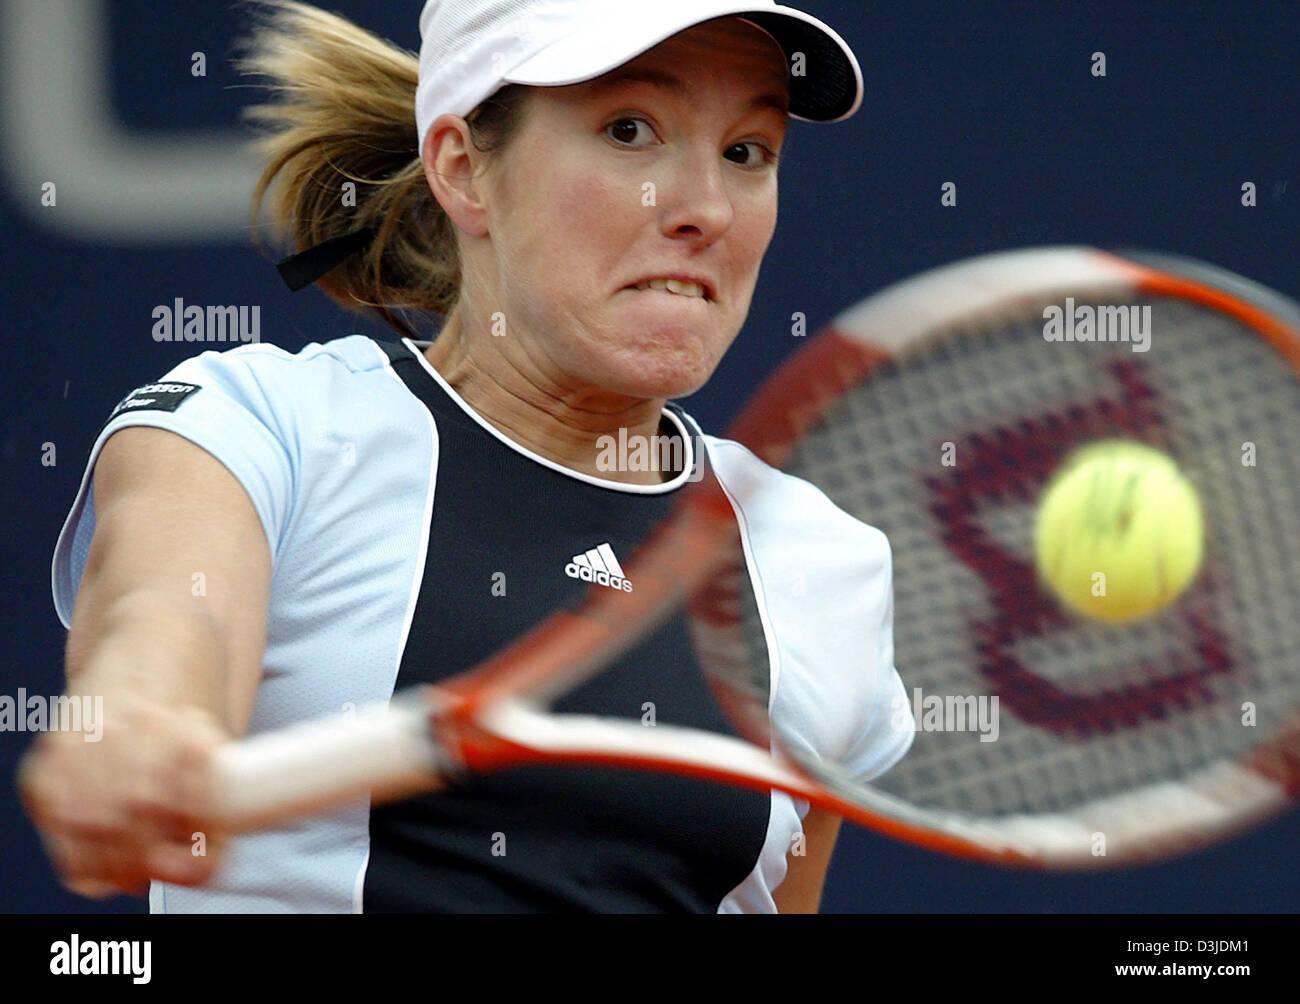 dpa Belgian tennis pro Justine Henin Hardenne looks exerted